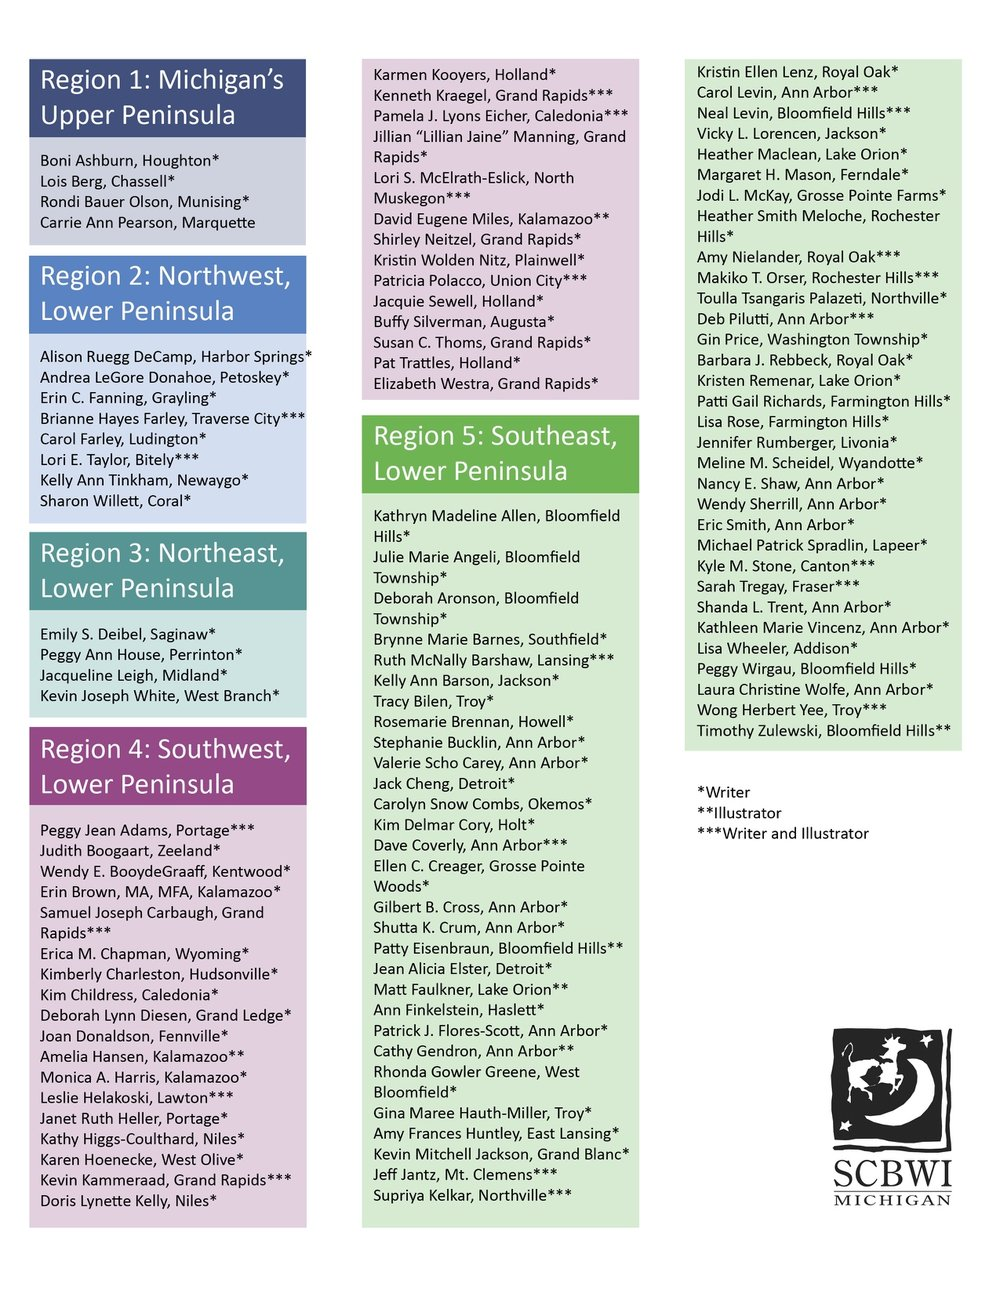 PAL Directory Flyer.jpg